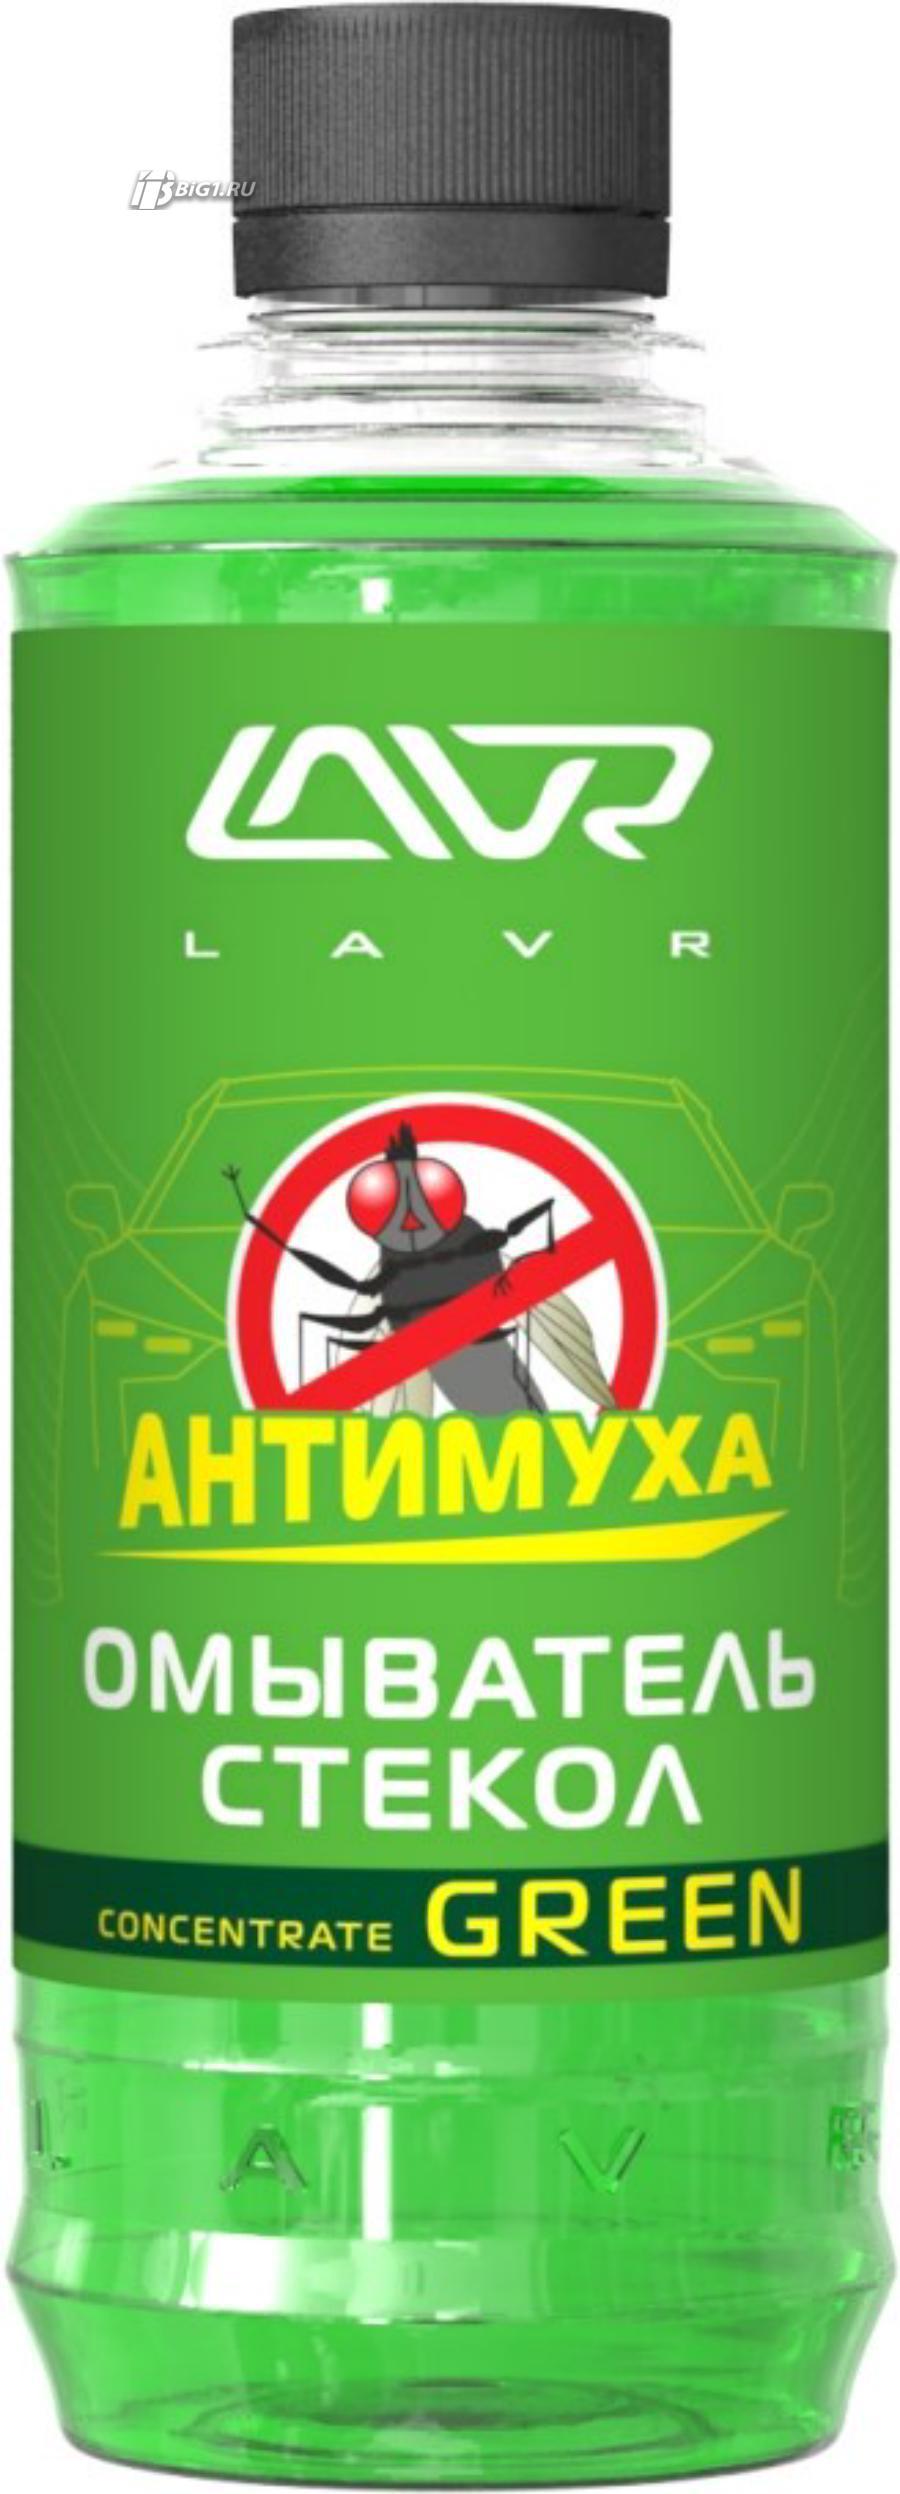 Омыватель стекол Green Анти Муха концентрат LAVR Glass Anti Fly